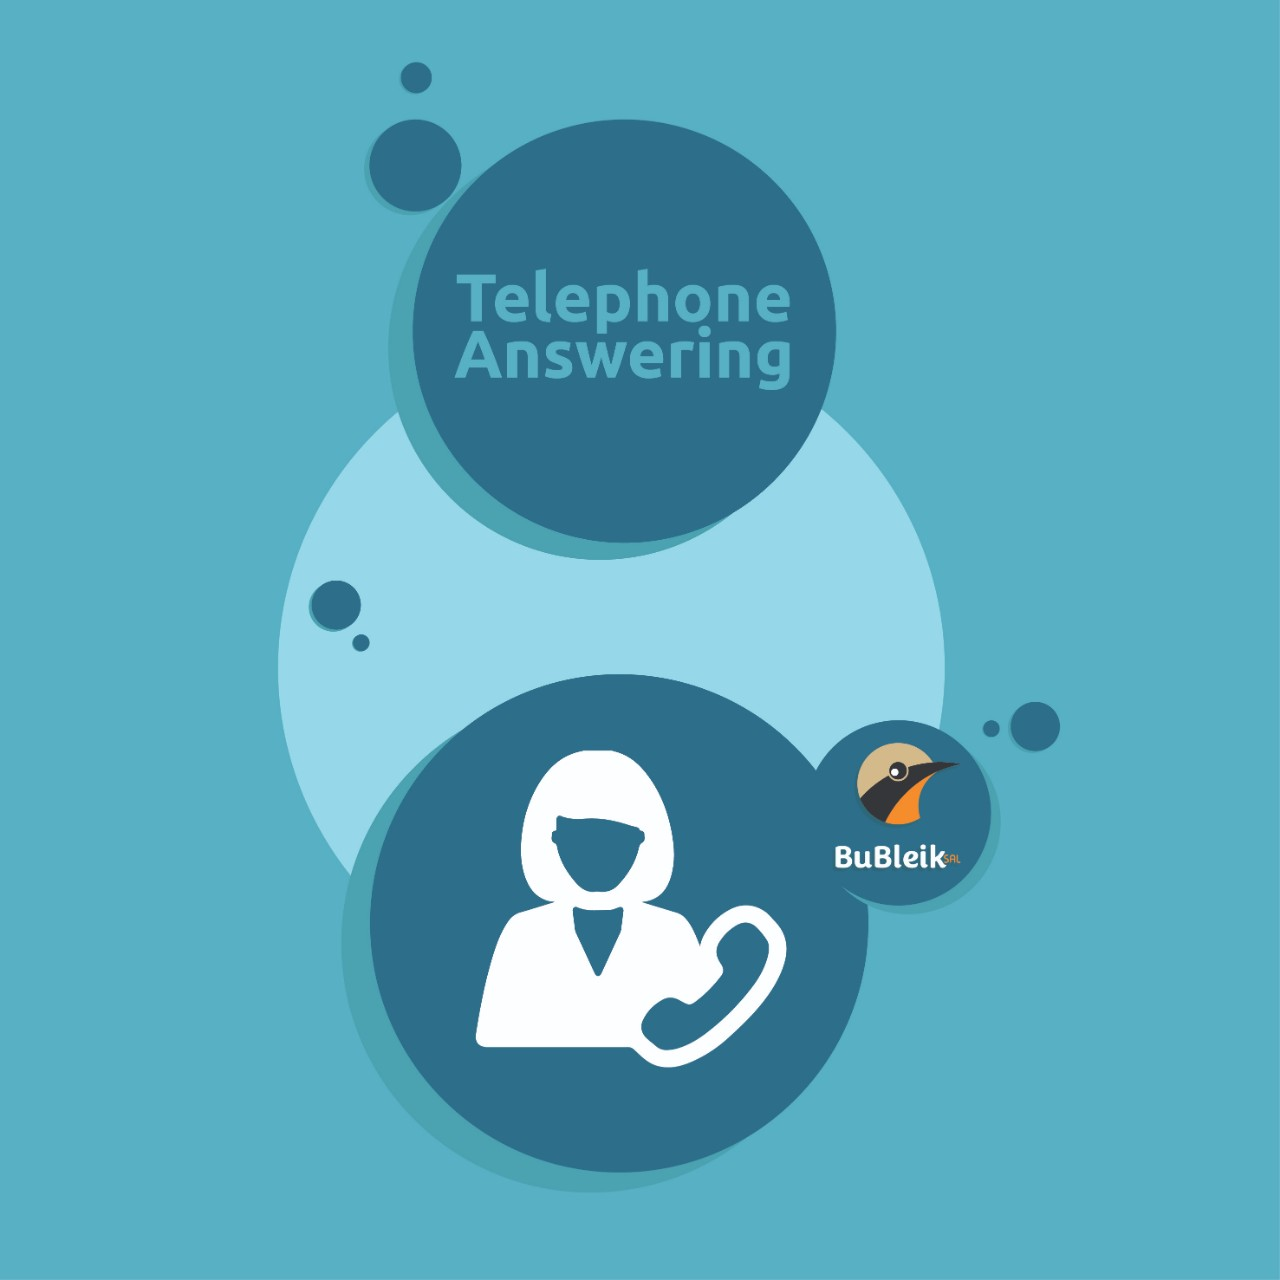 Telephone Answering